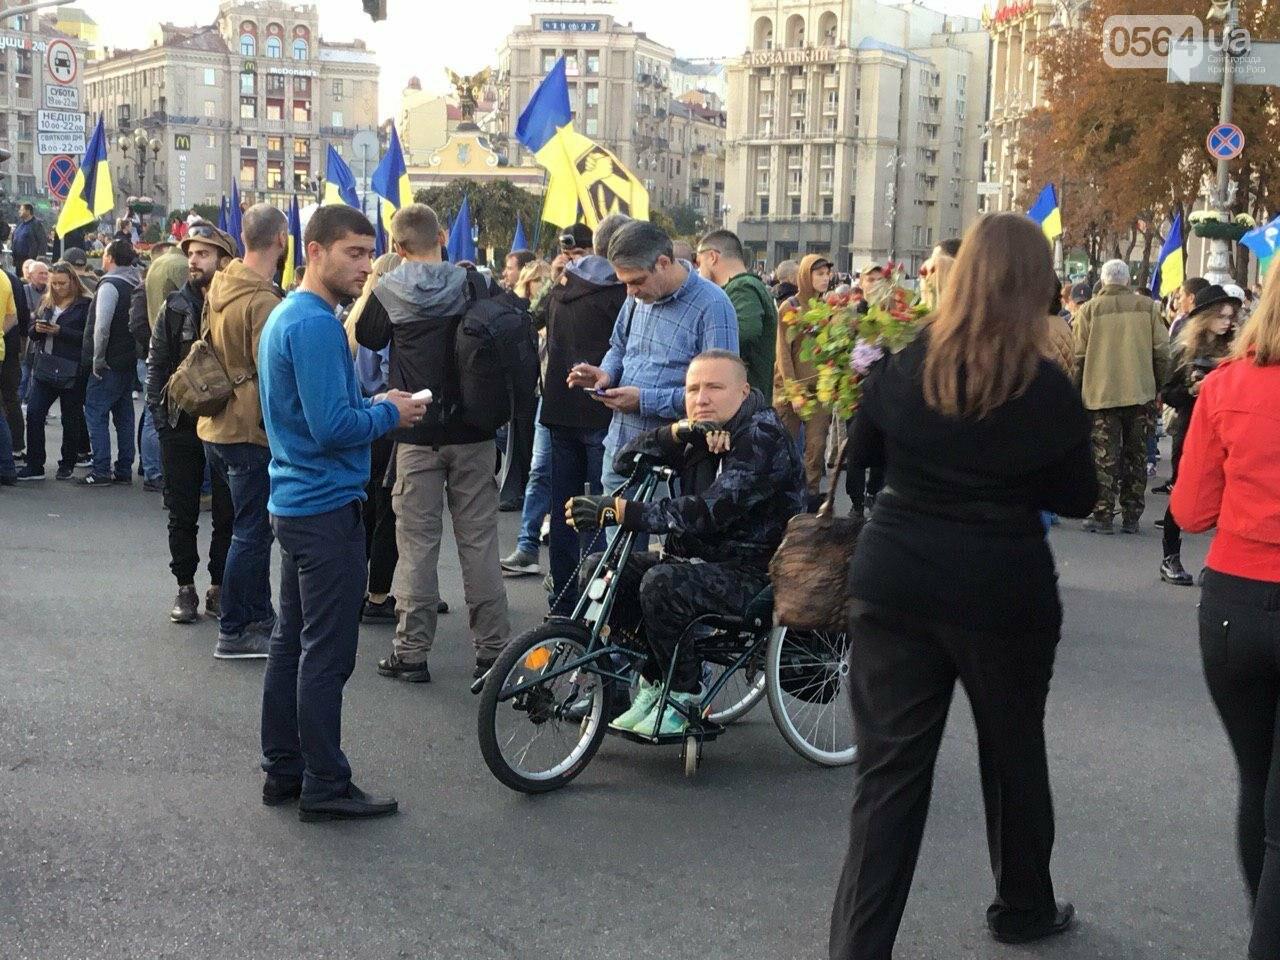 Криворожане поддержали Марш сопротивления капитуляции в Киеве, - ФОТО, ВИДЕО, ОБНОВЛЕНО, фото-34